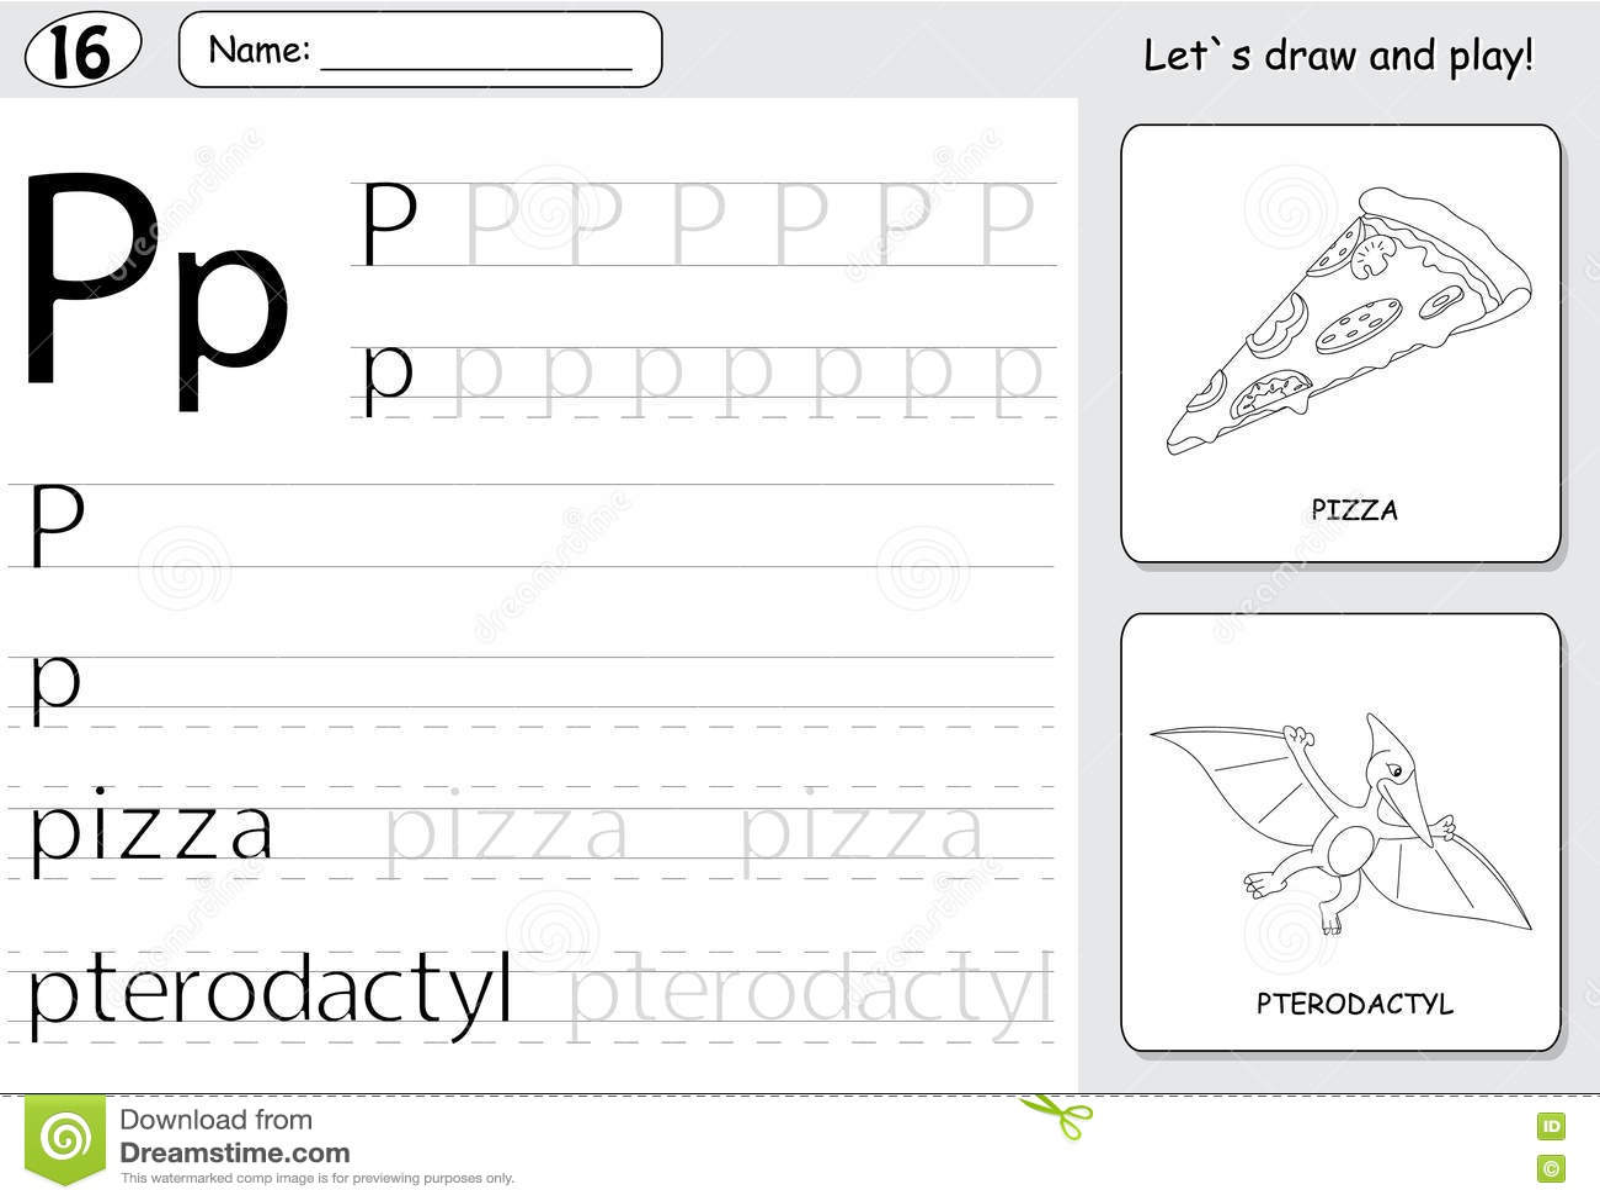 Cartoon Pizza And Pterodactyl Alphabet Tracing Worksheet